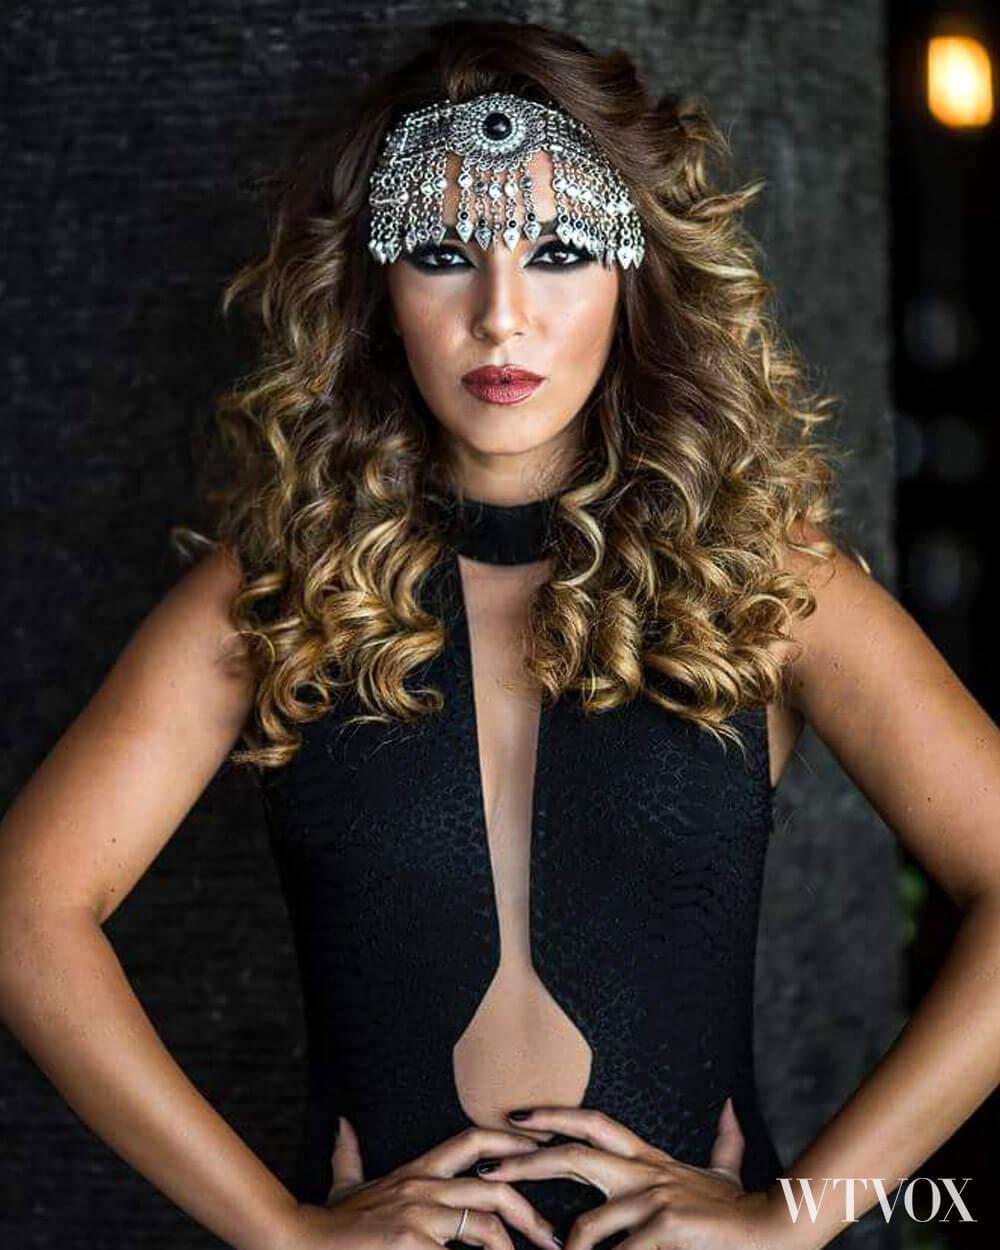 Egyptian Fashion Designers - Norine Farah